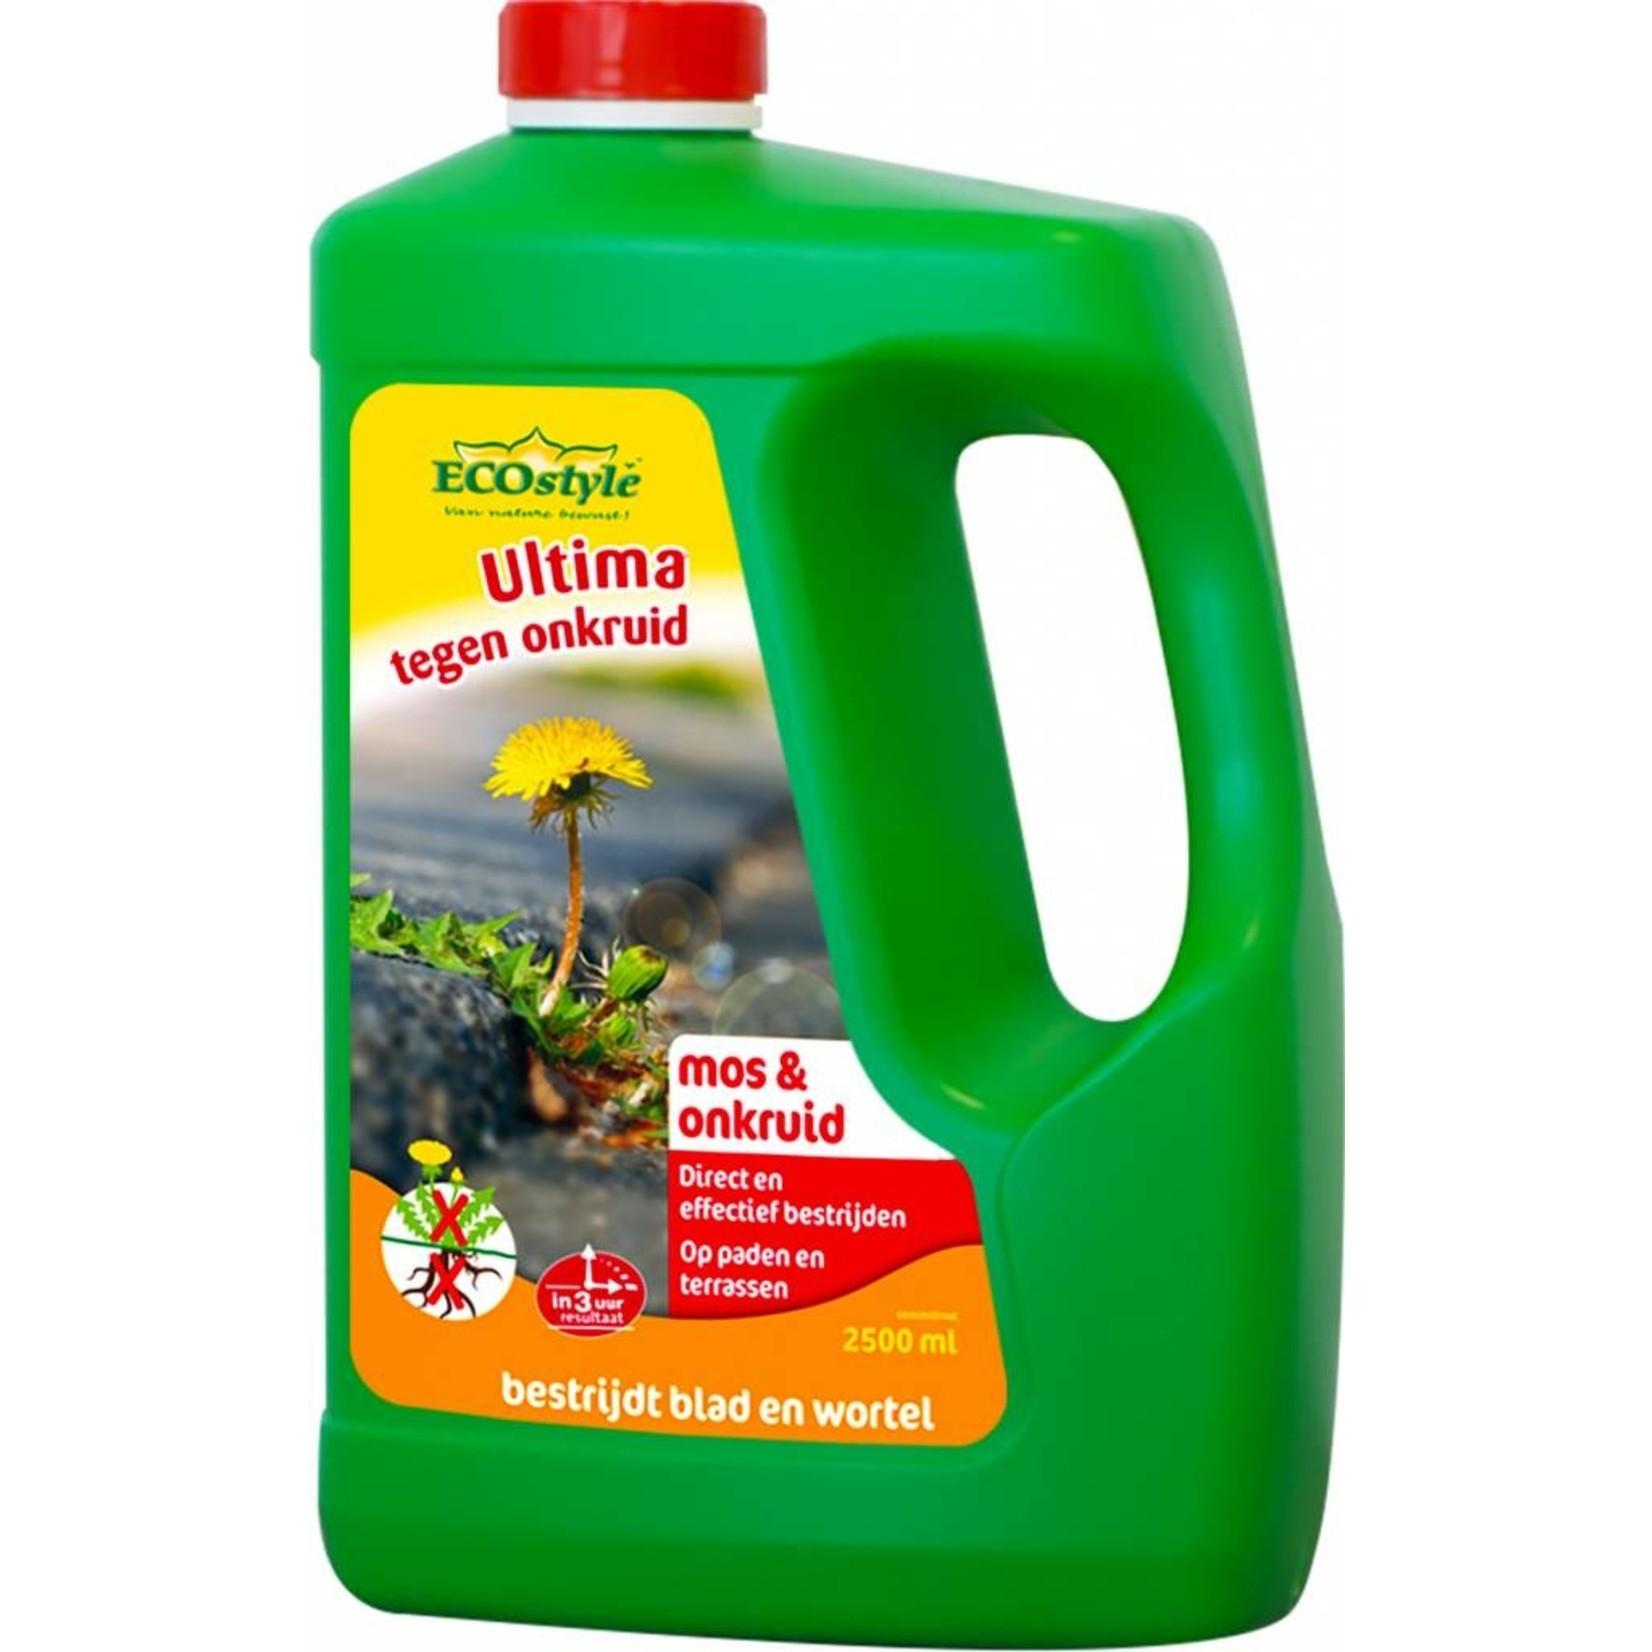 Ecostyle Ultima tegen onkruid & mos 2,5 liter (concentraat)